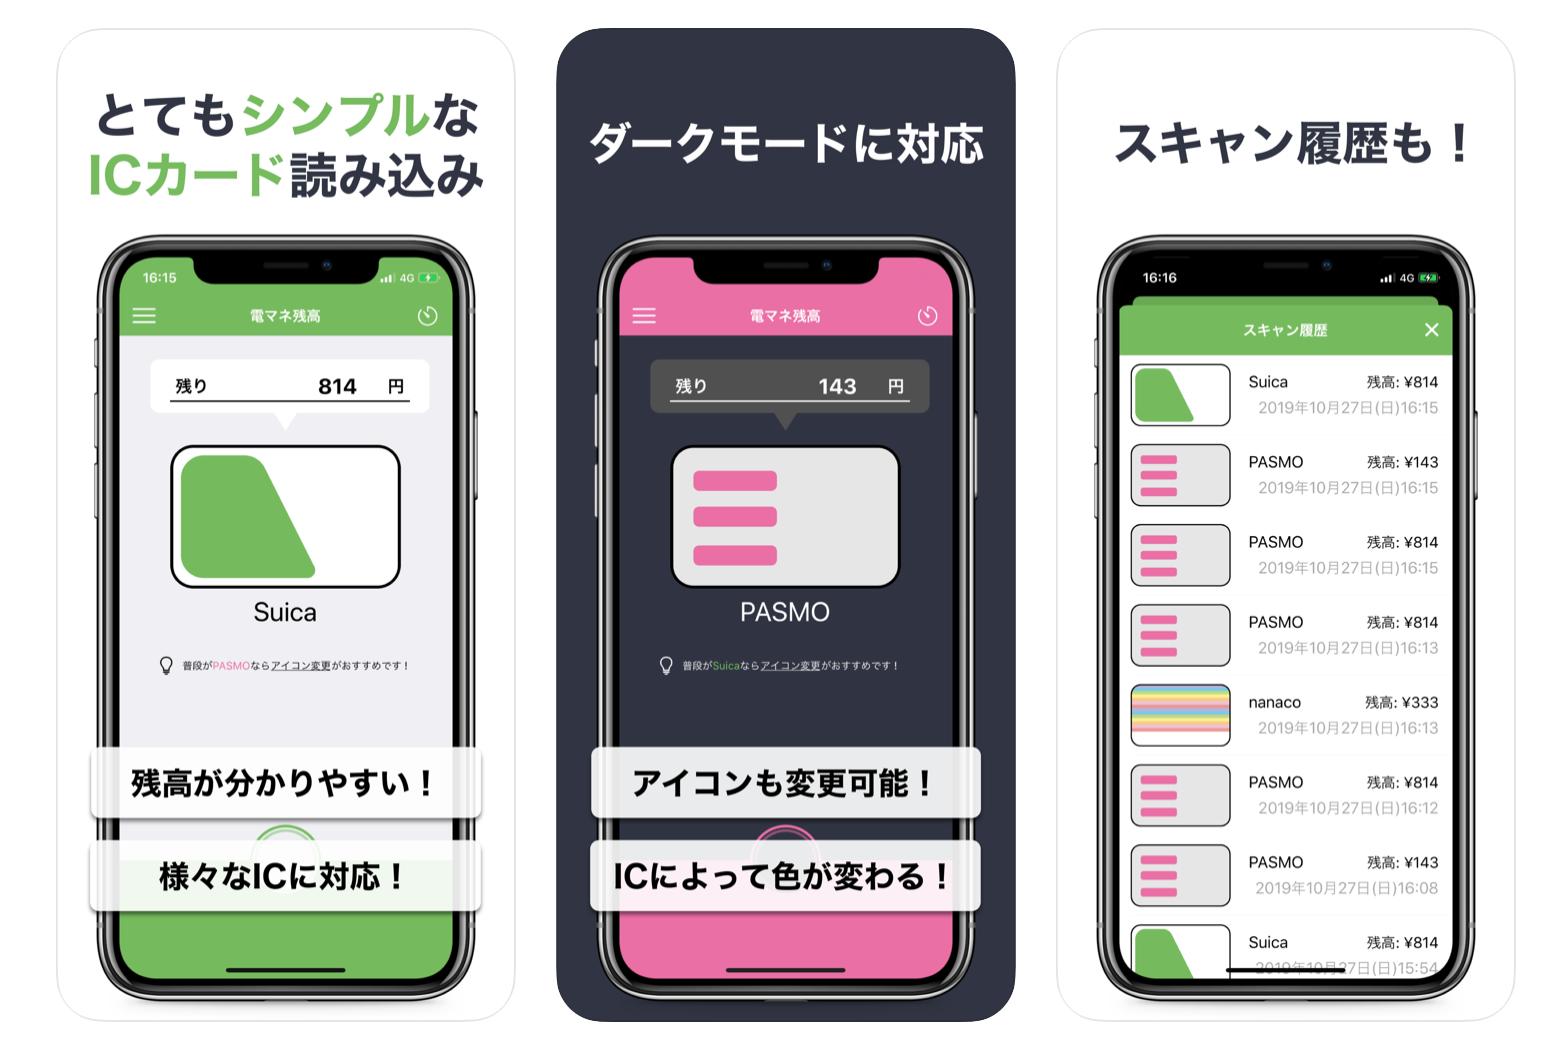 iPhone 電マネ残高アプリのスクリーンショット